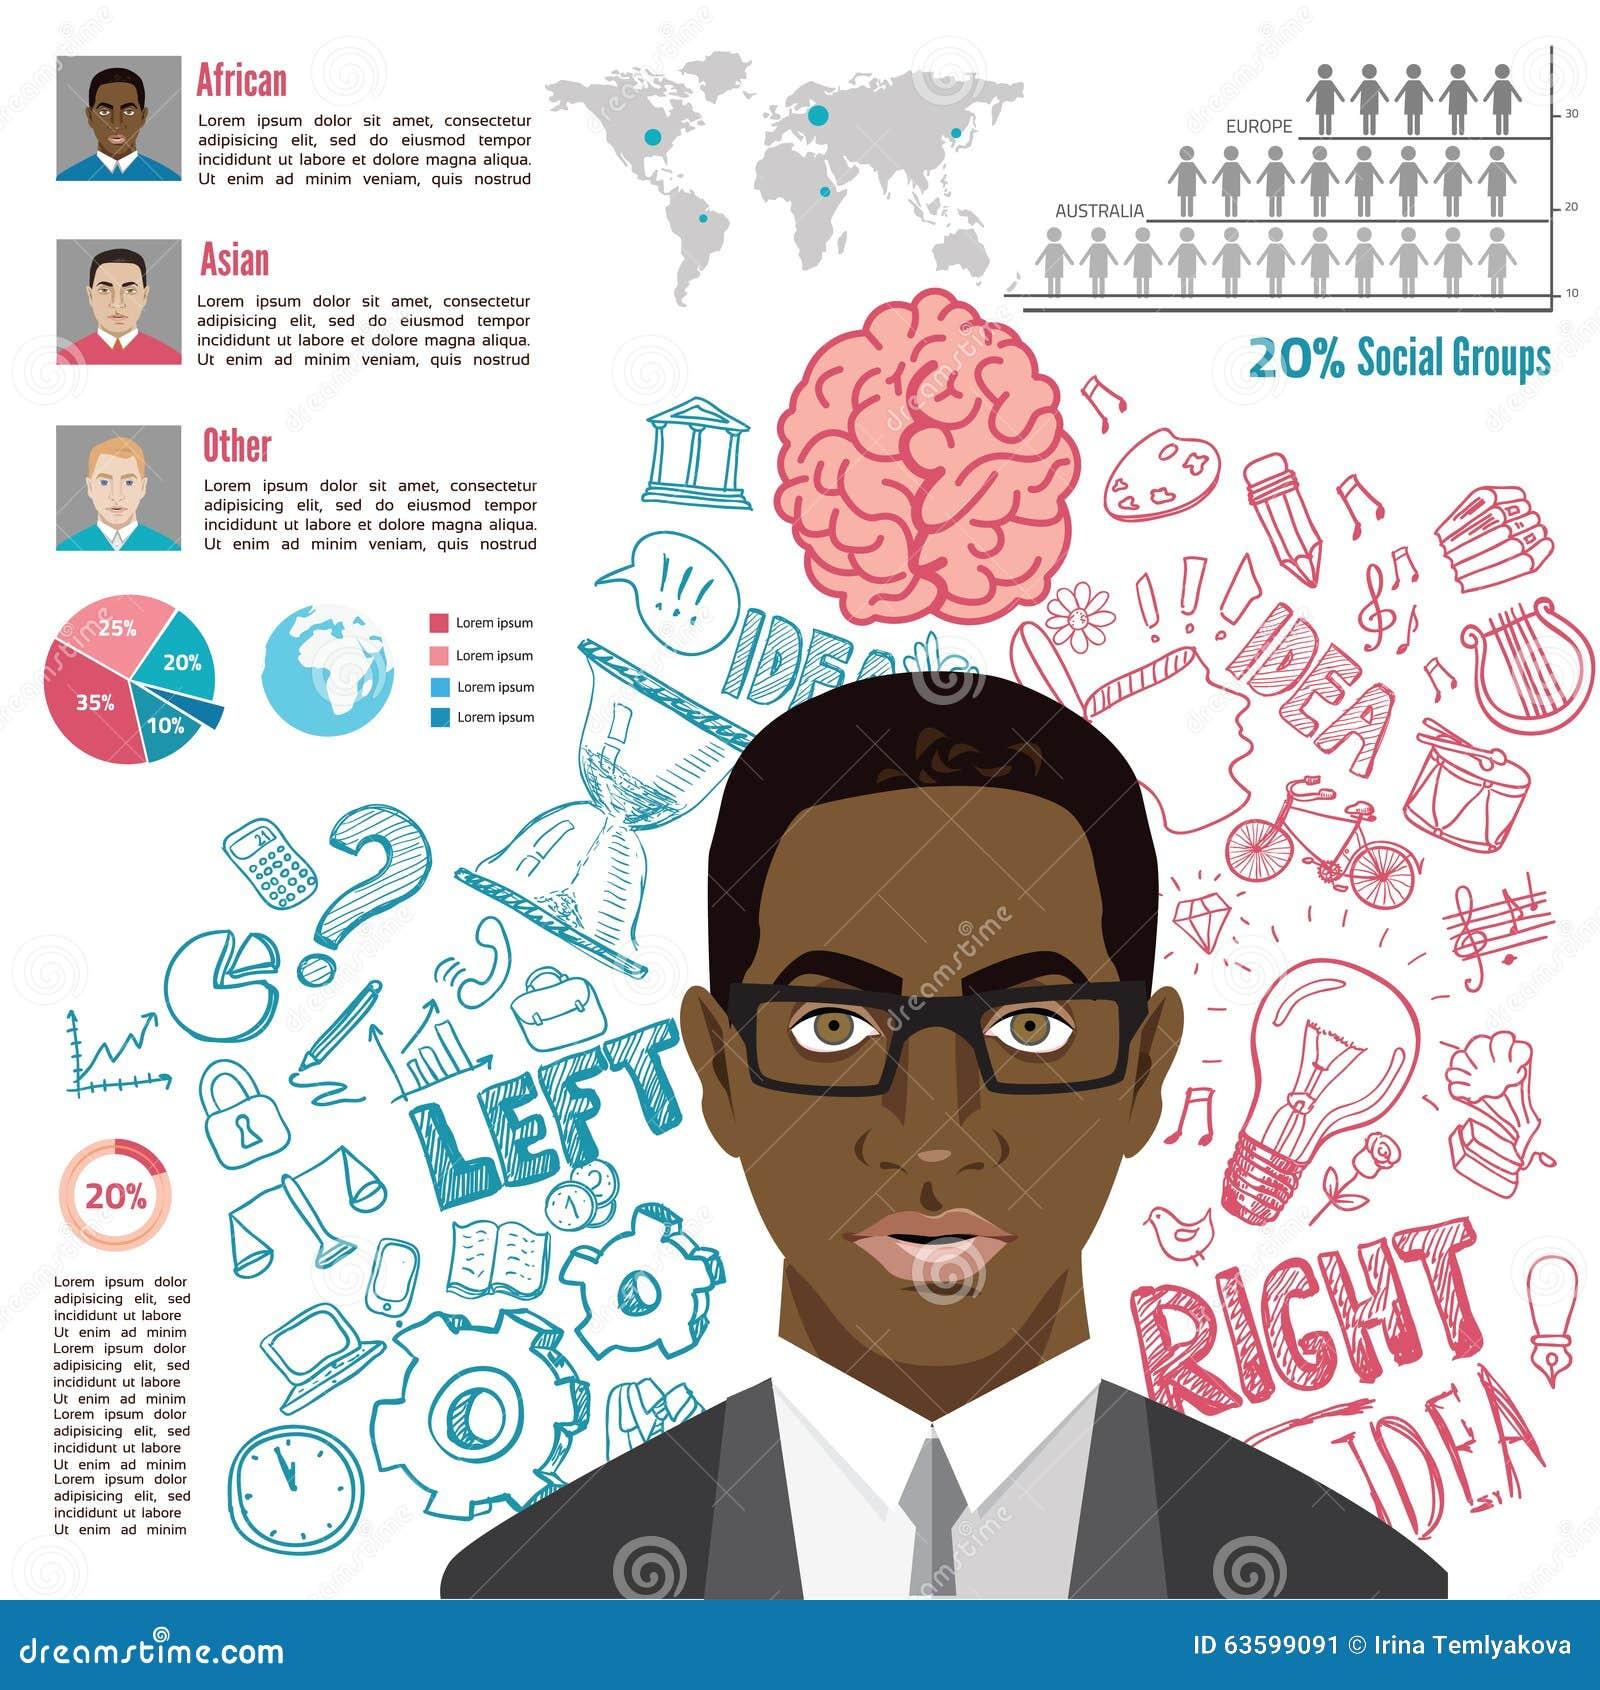 AffärsmanAfrican American Ethnic ledare